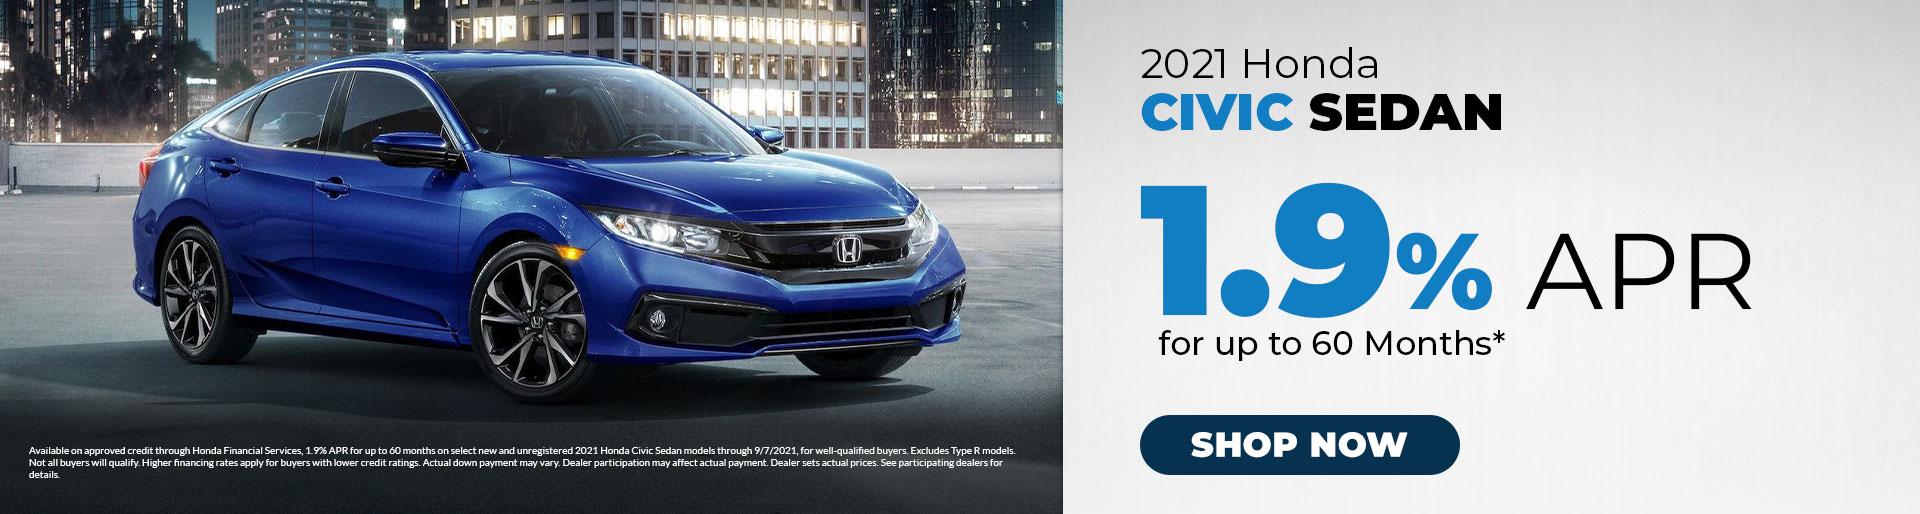 2021 Honda Civic Sedan Offer